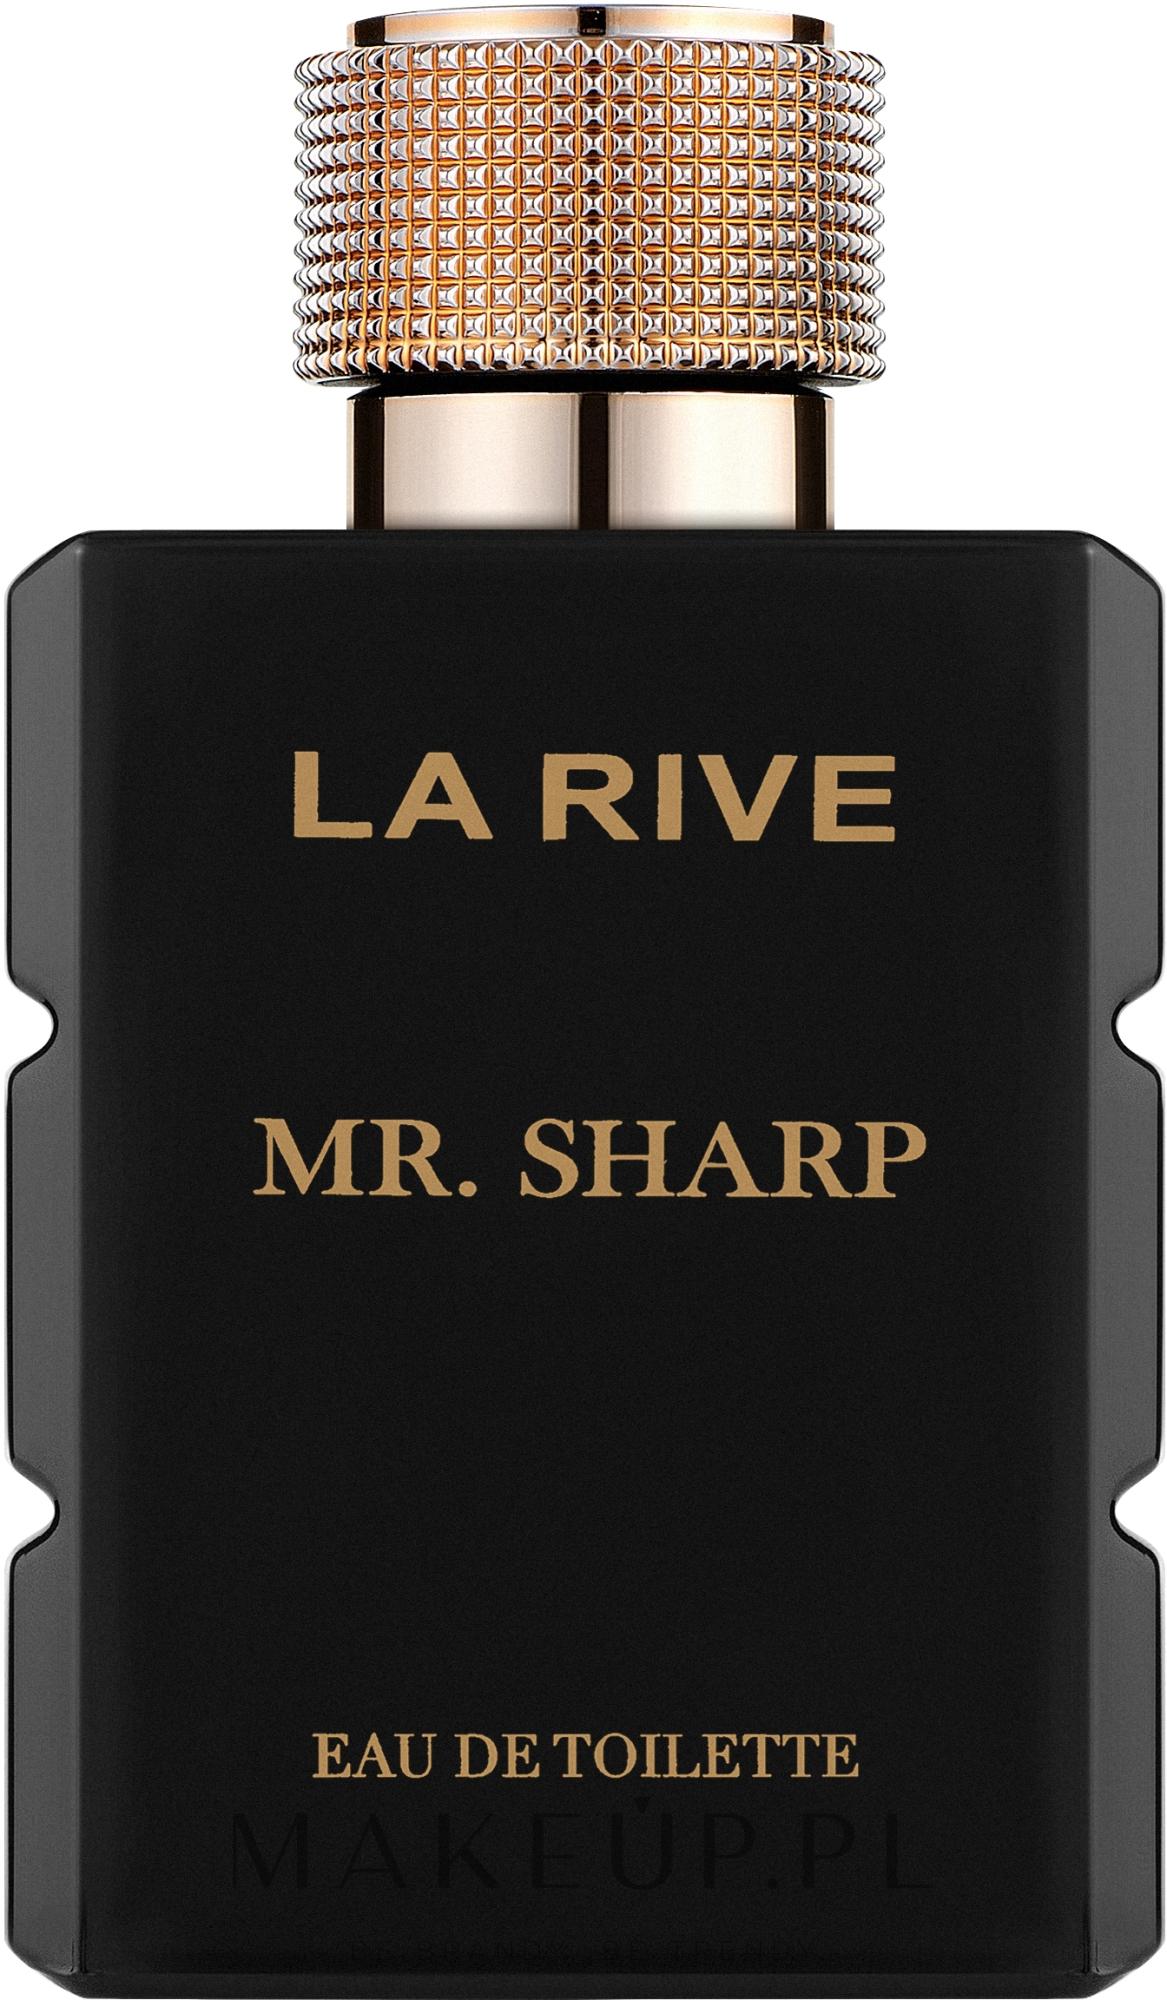 la rive mr. sharp